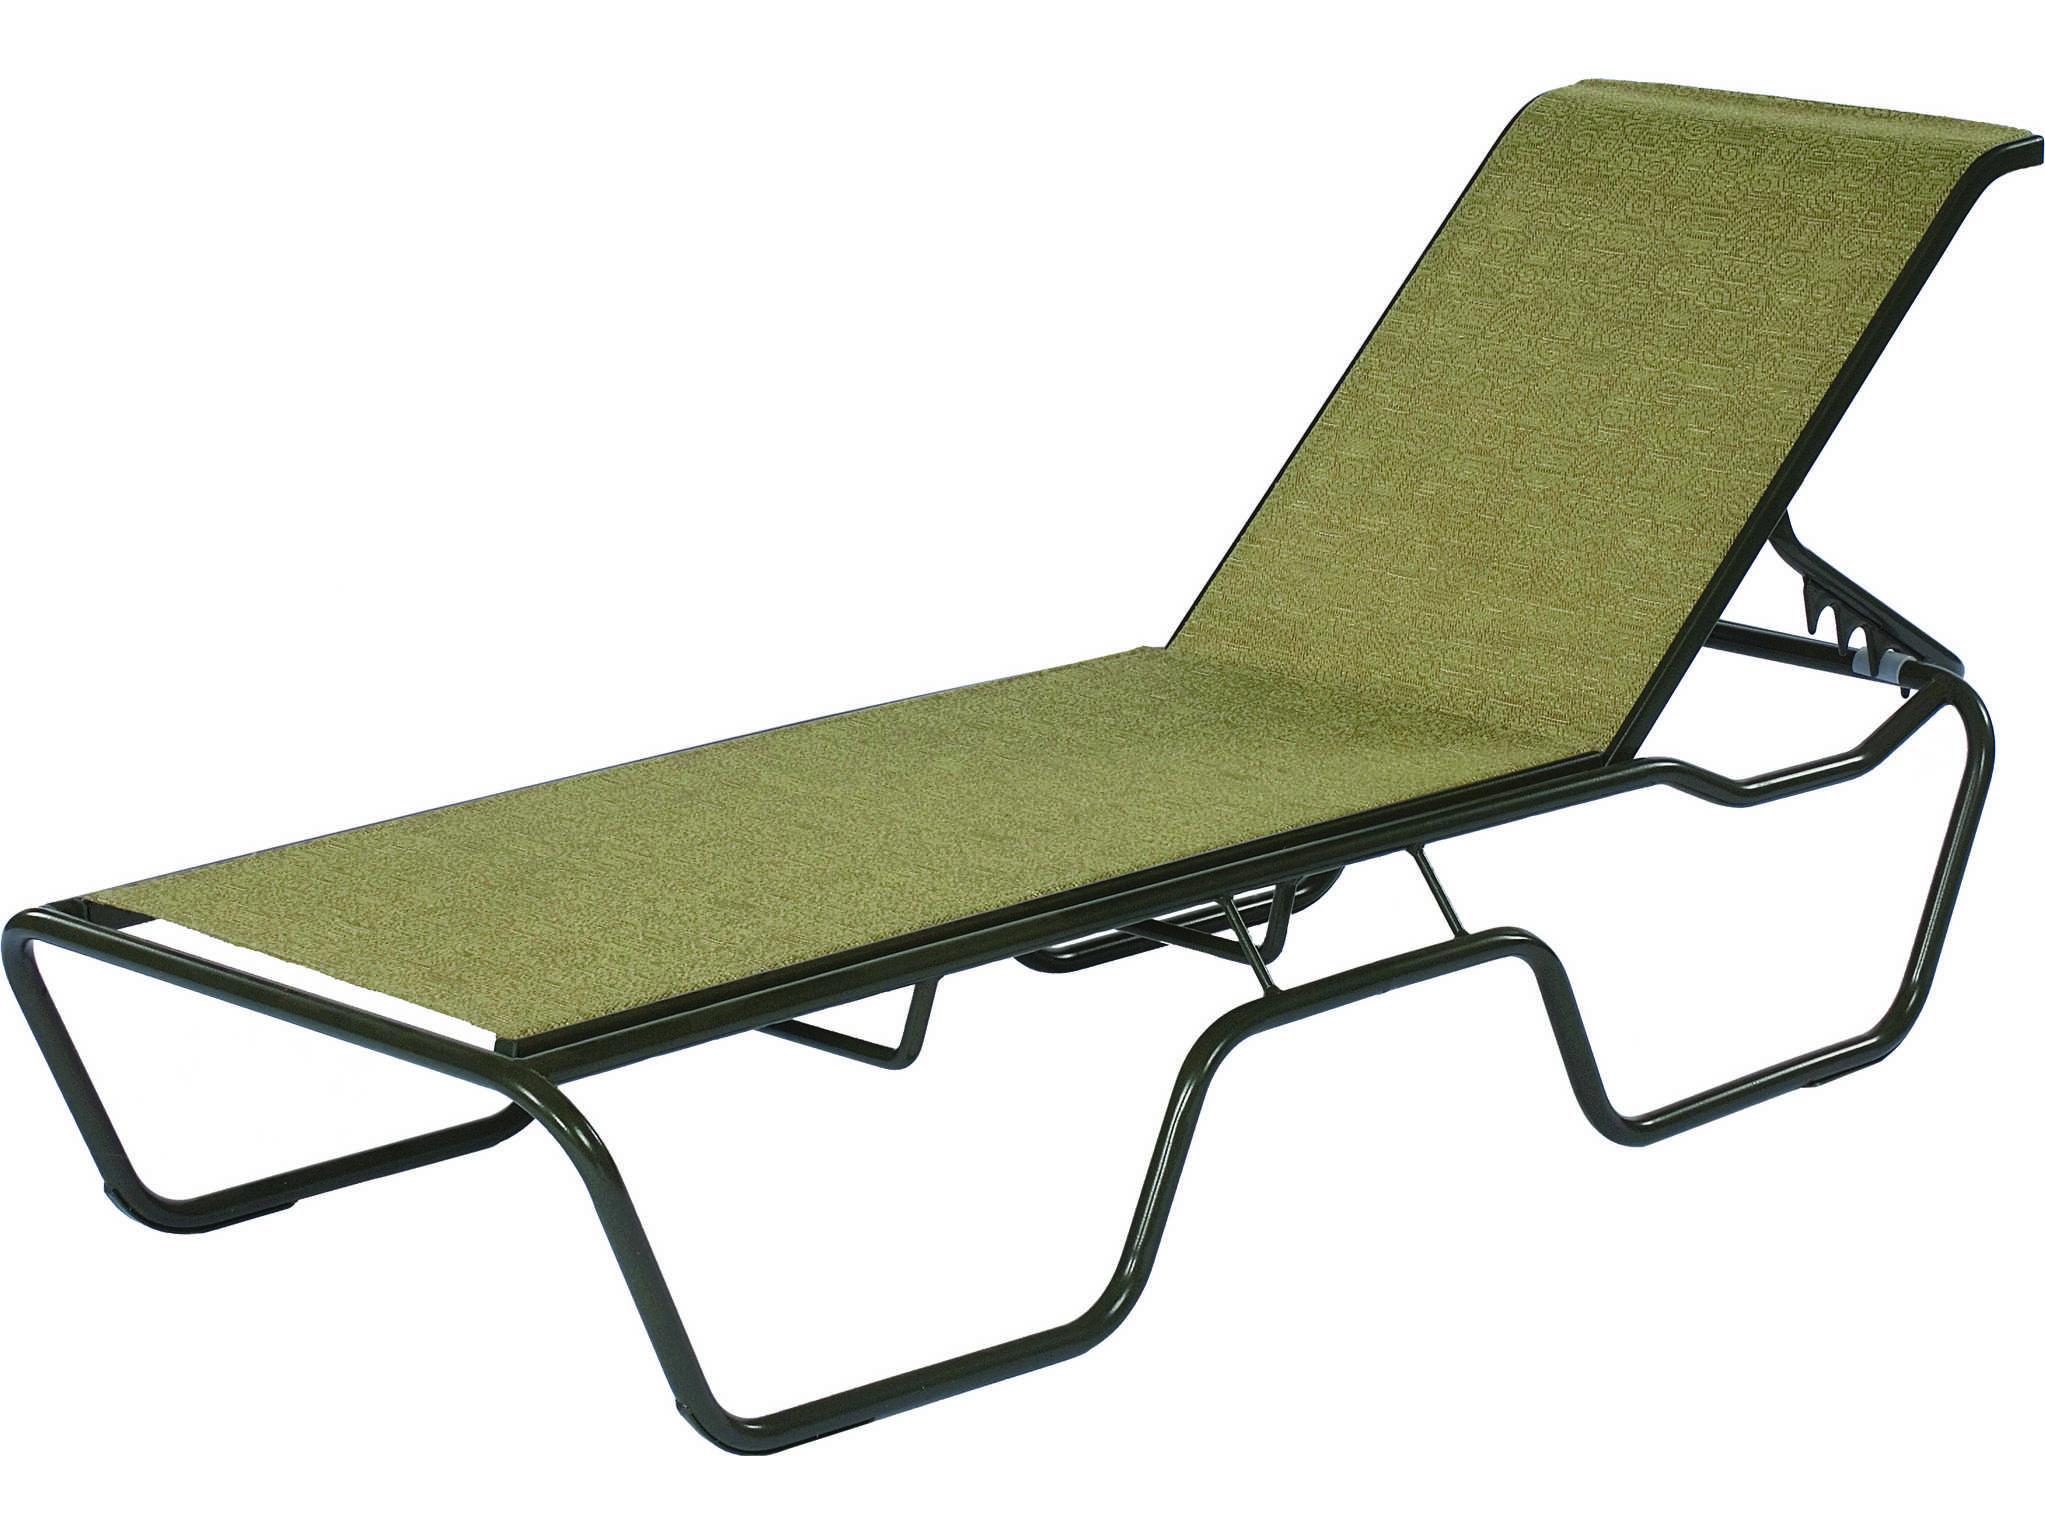 suncoast sanibel sling cast aluminum stackable chaise 1913. Black Bedroom Furniture Sets. Home Design Ideas